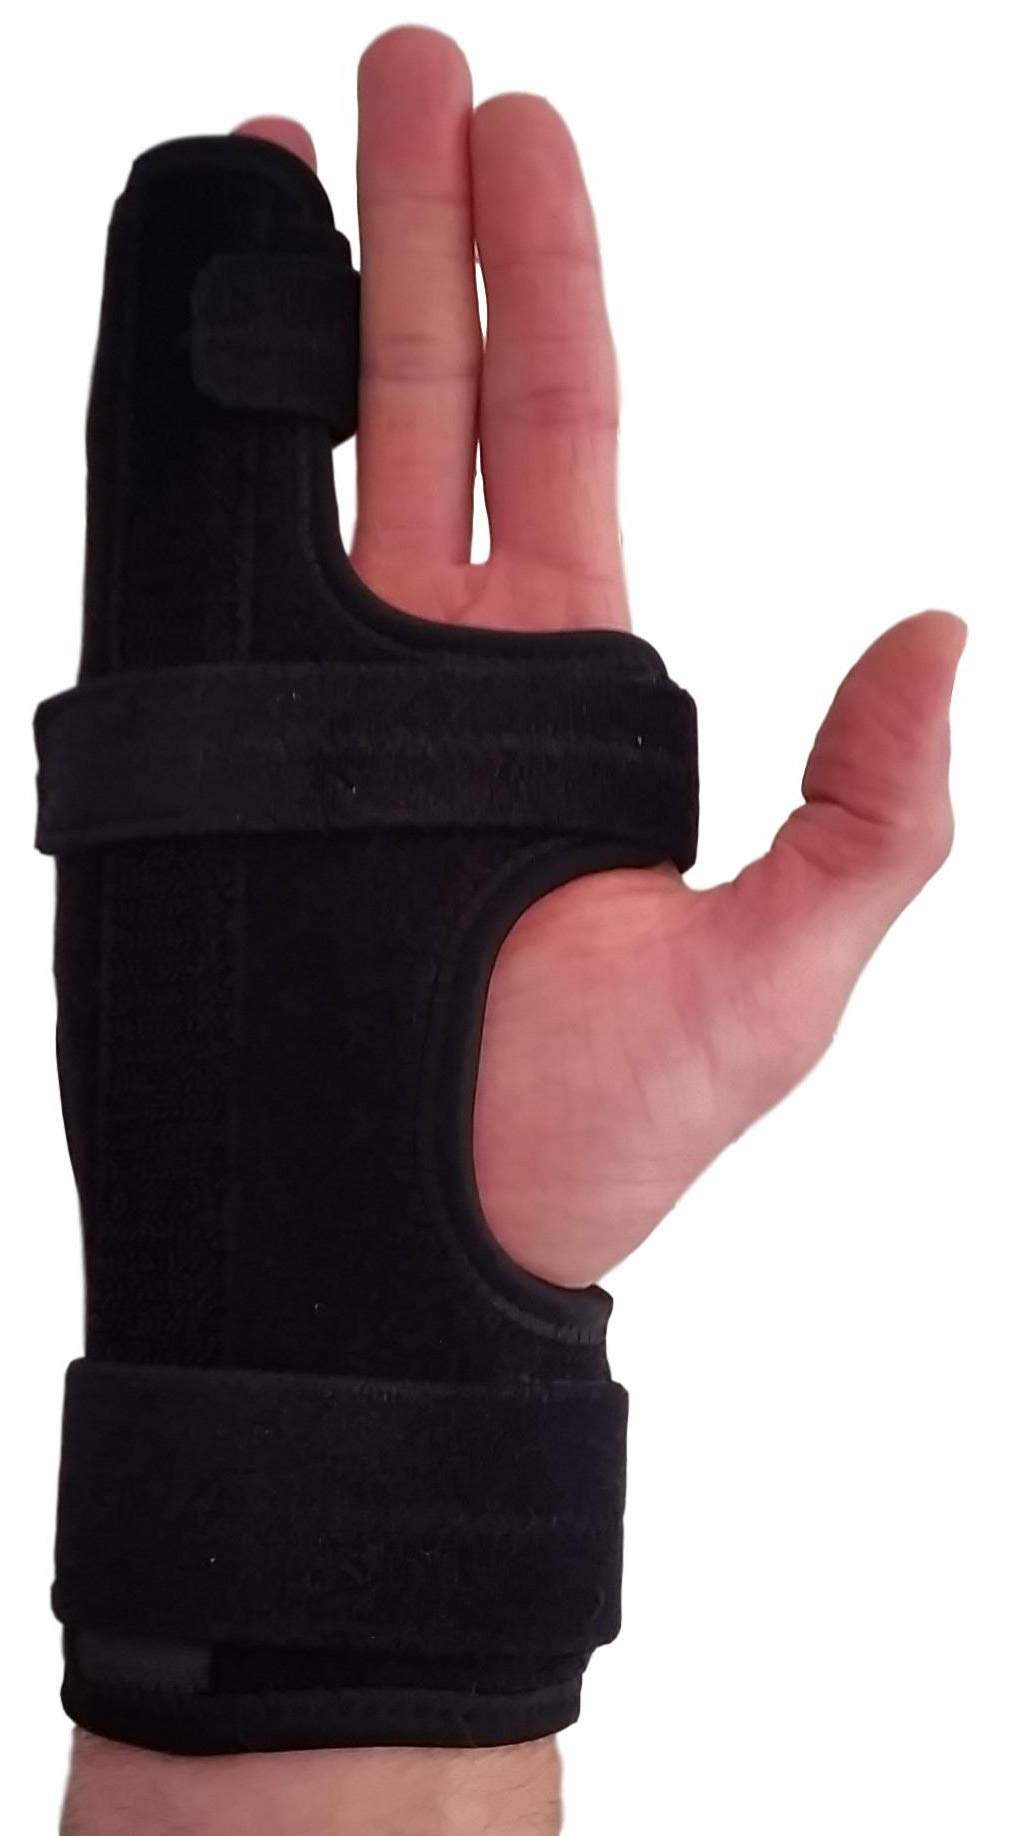 Metacarpal Finger Splint Hand Brace - Hand Brace & Metacarpal Support for Broken Fingers, Wrist & Hand Injuries or Little Finger Fracture (Right - Small/Med)